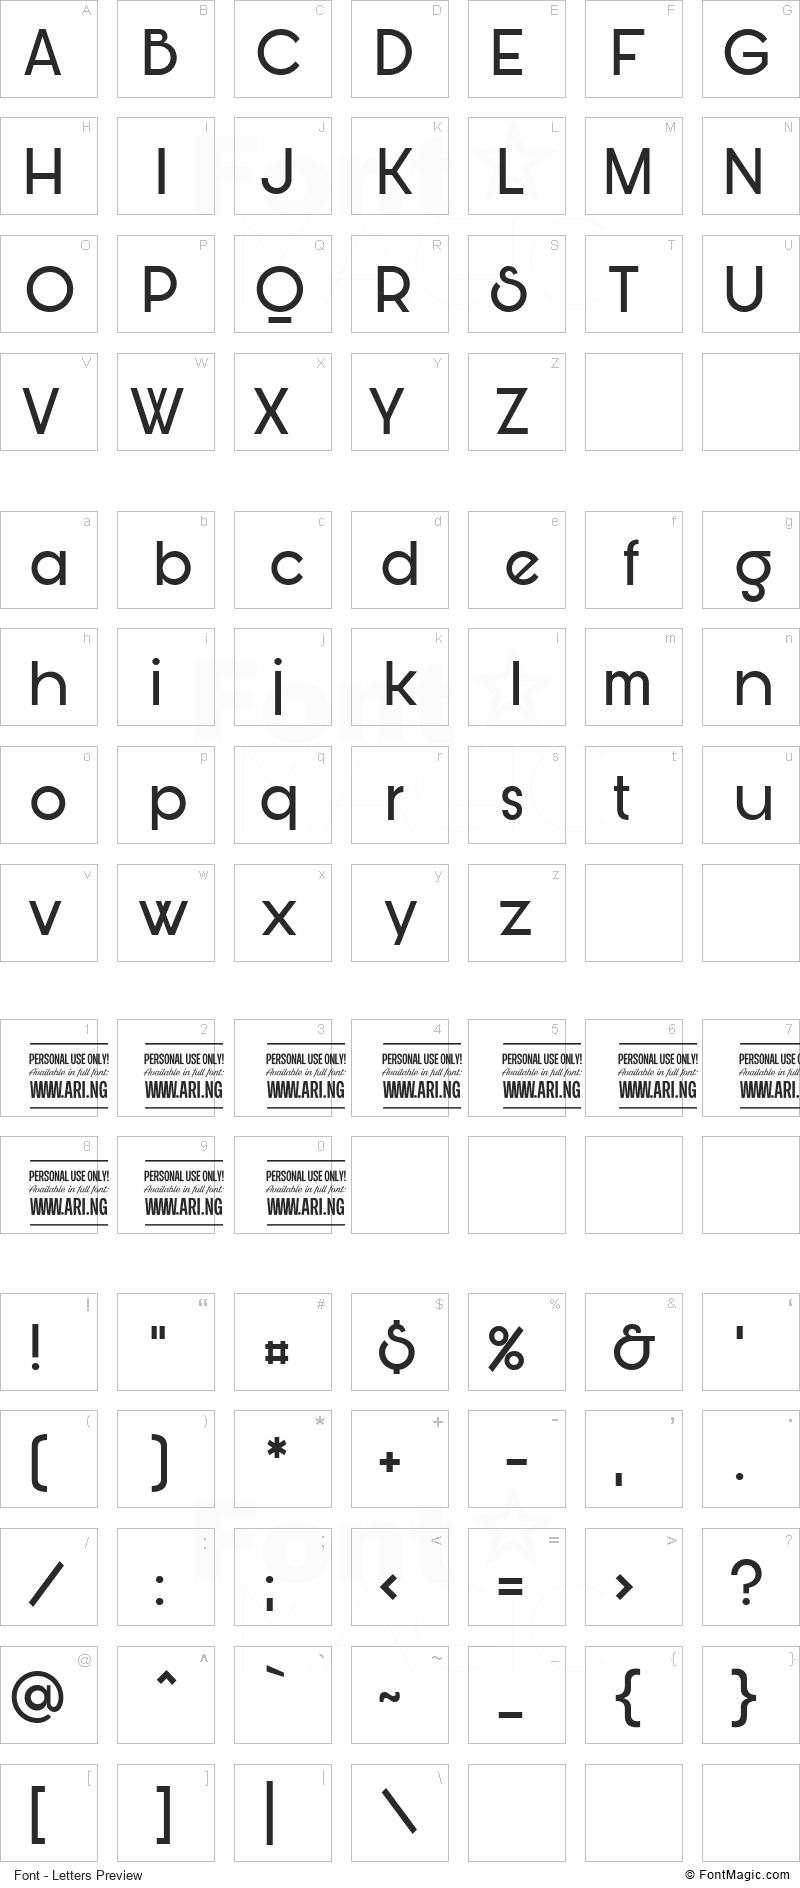 Bunya Font - All Latters Preview Chart